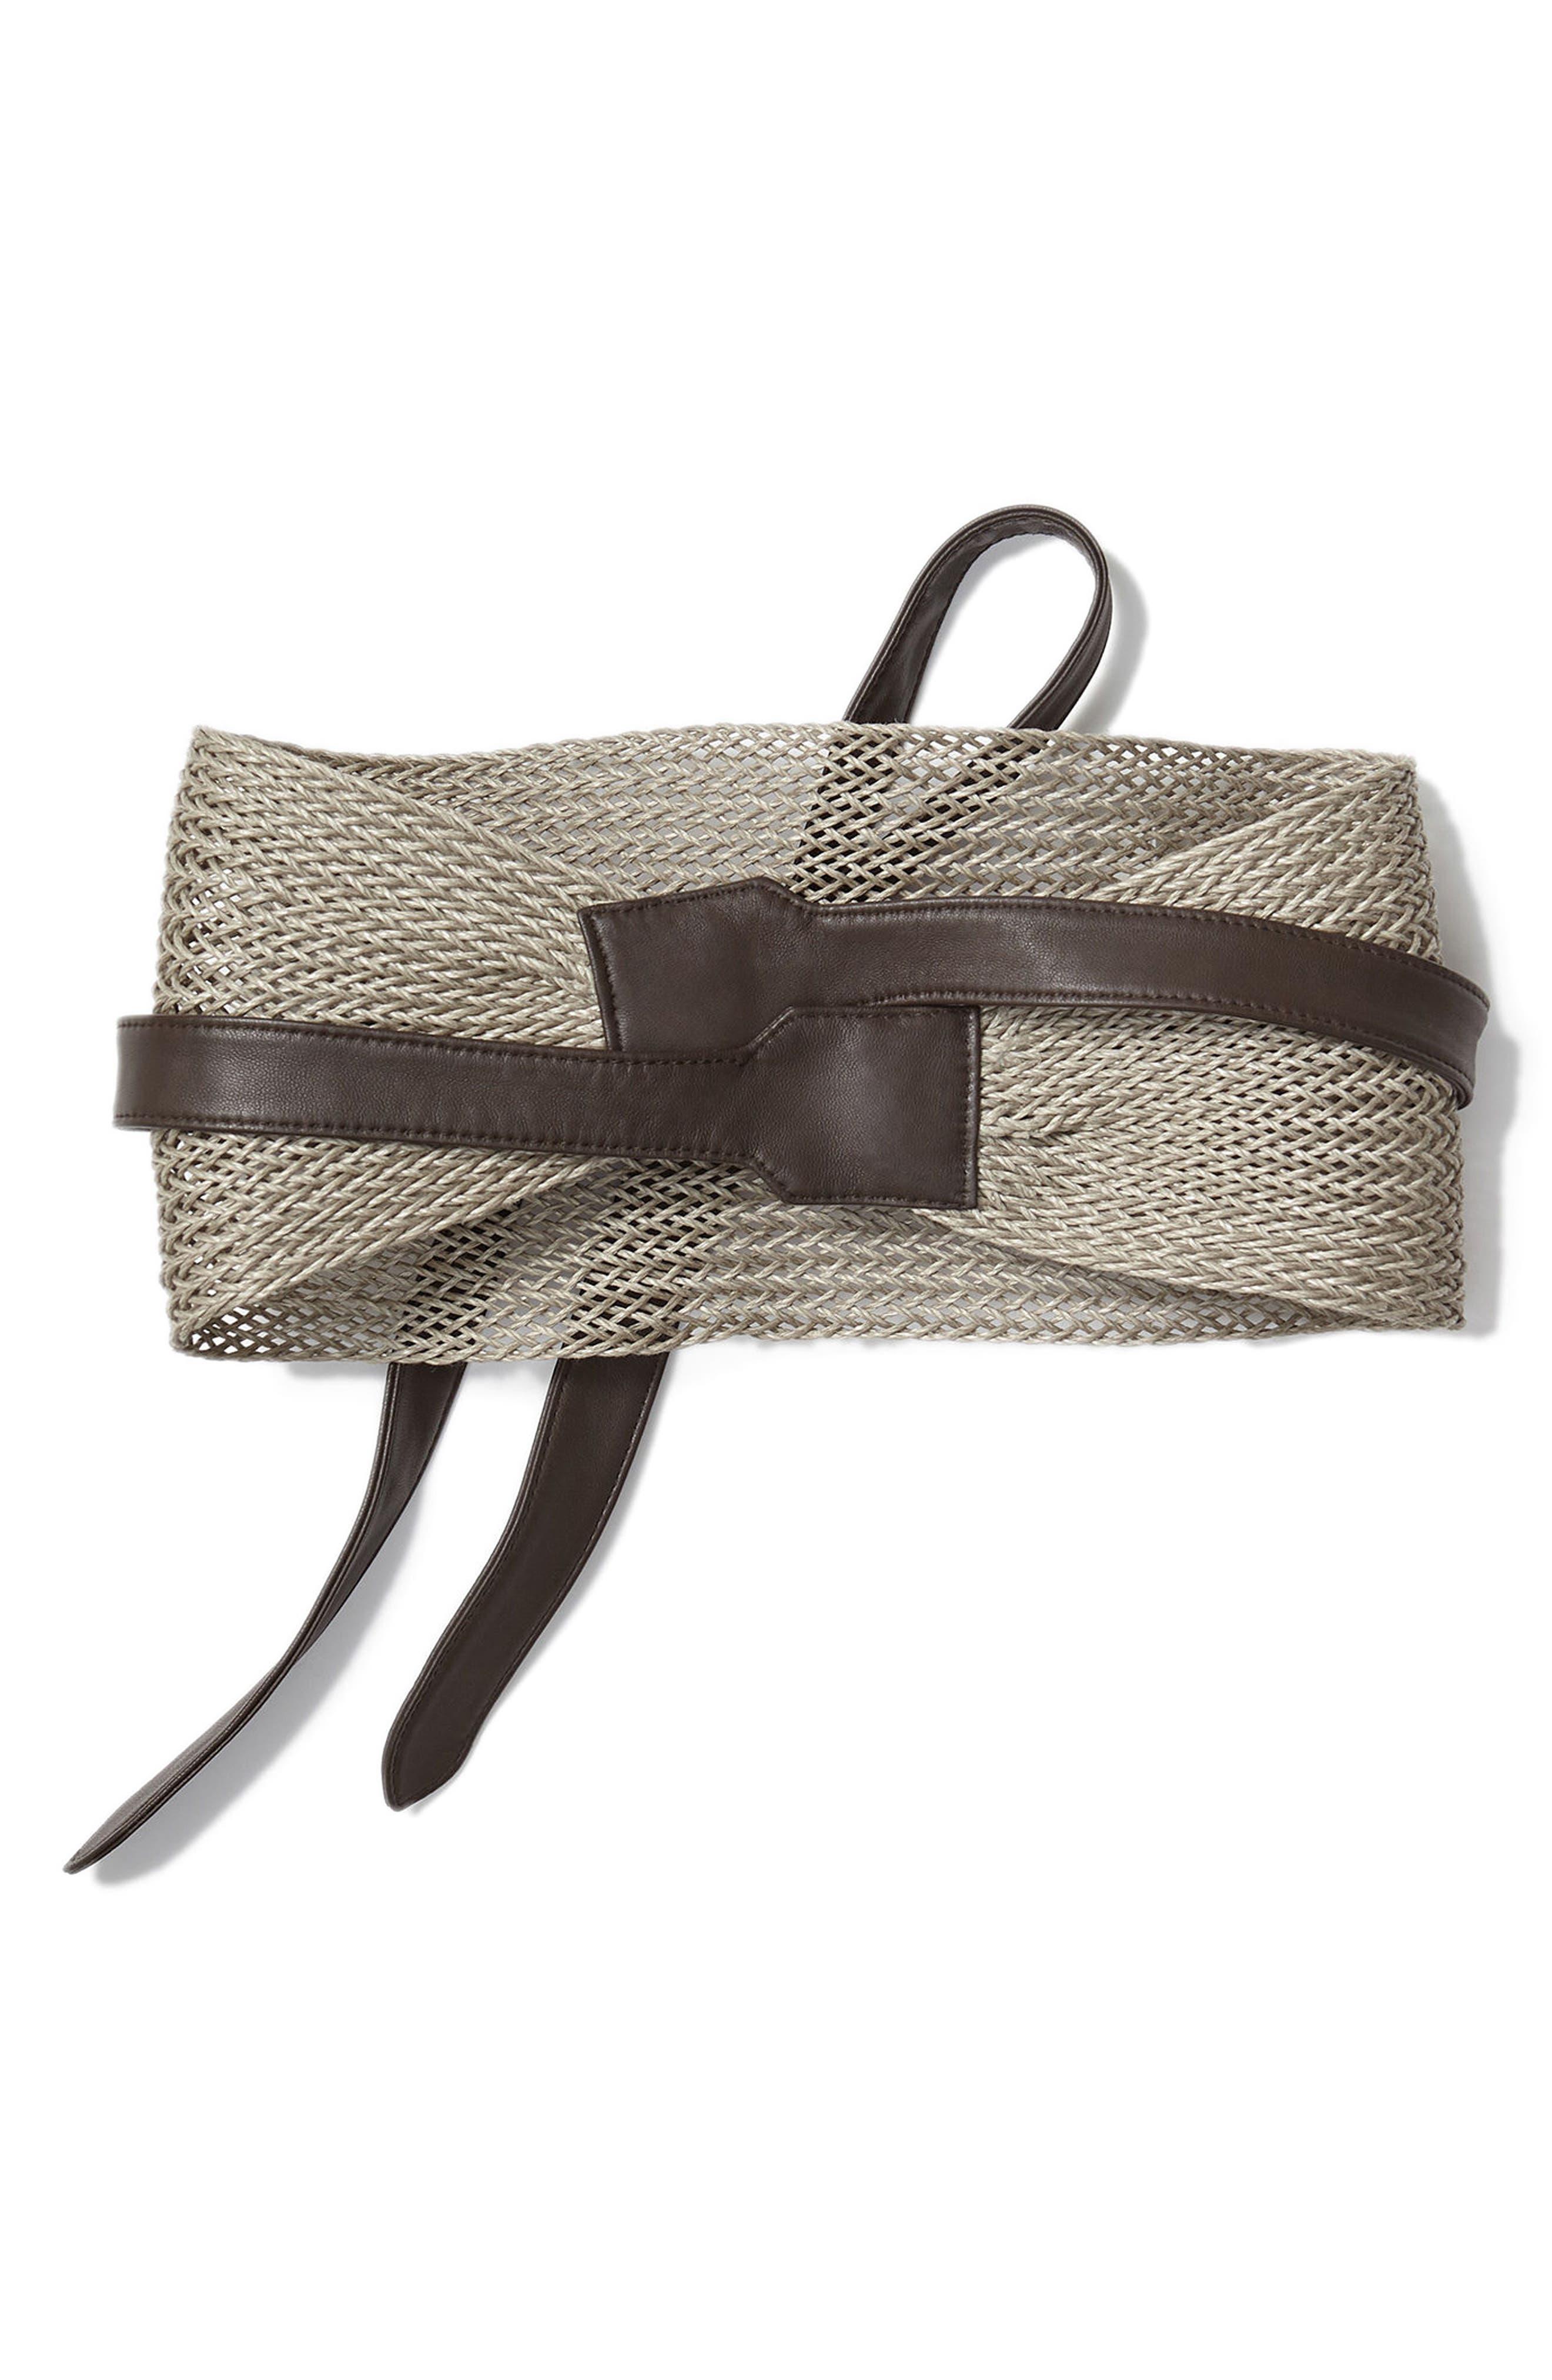 Obi Linen & Leather Belt,                             Alternate thumbnail 2, color,                             Nightingale